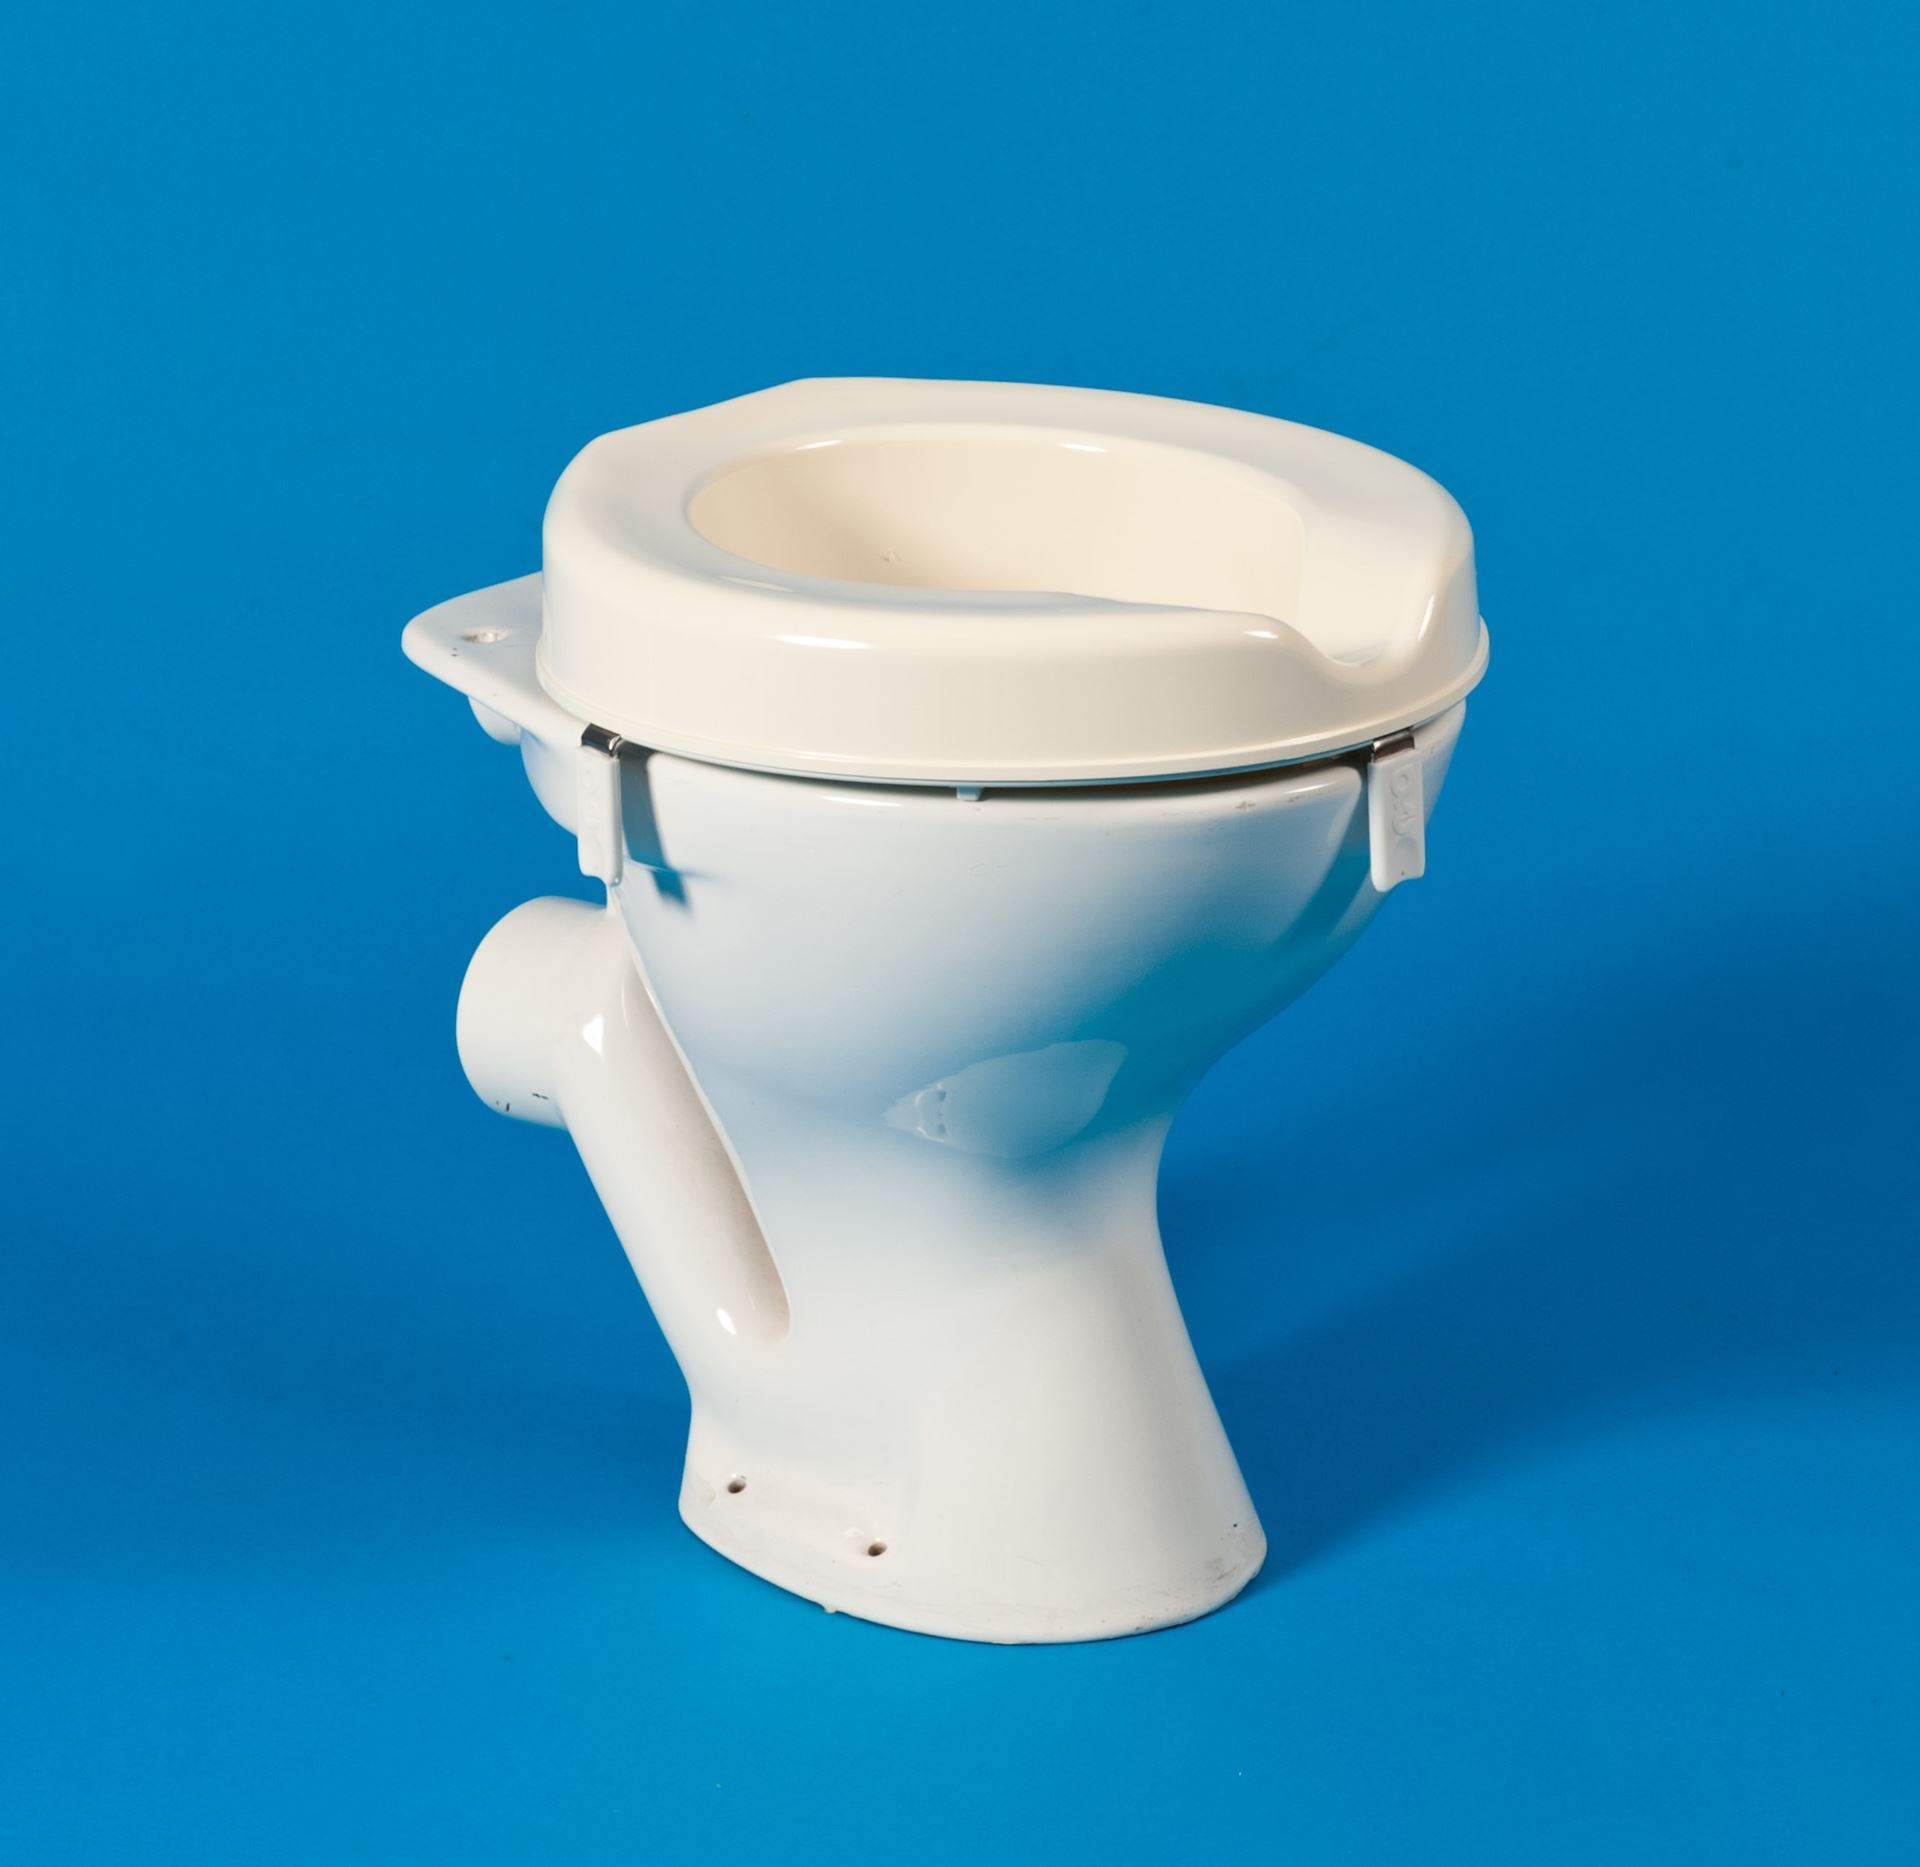 Outstanding Derby Raised Toilet Seat Machost Co Dining Chair Design Ideas Machostcouk